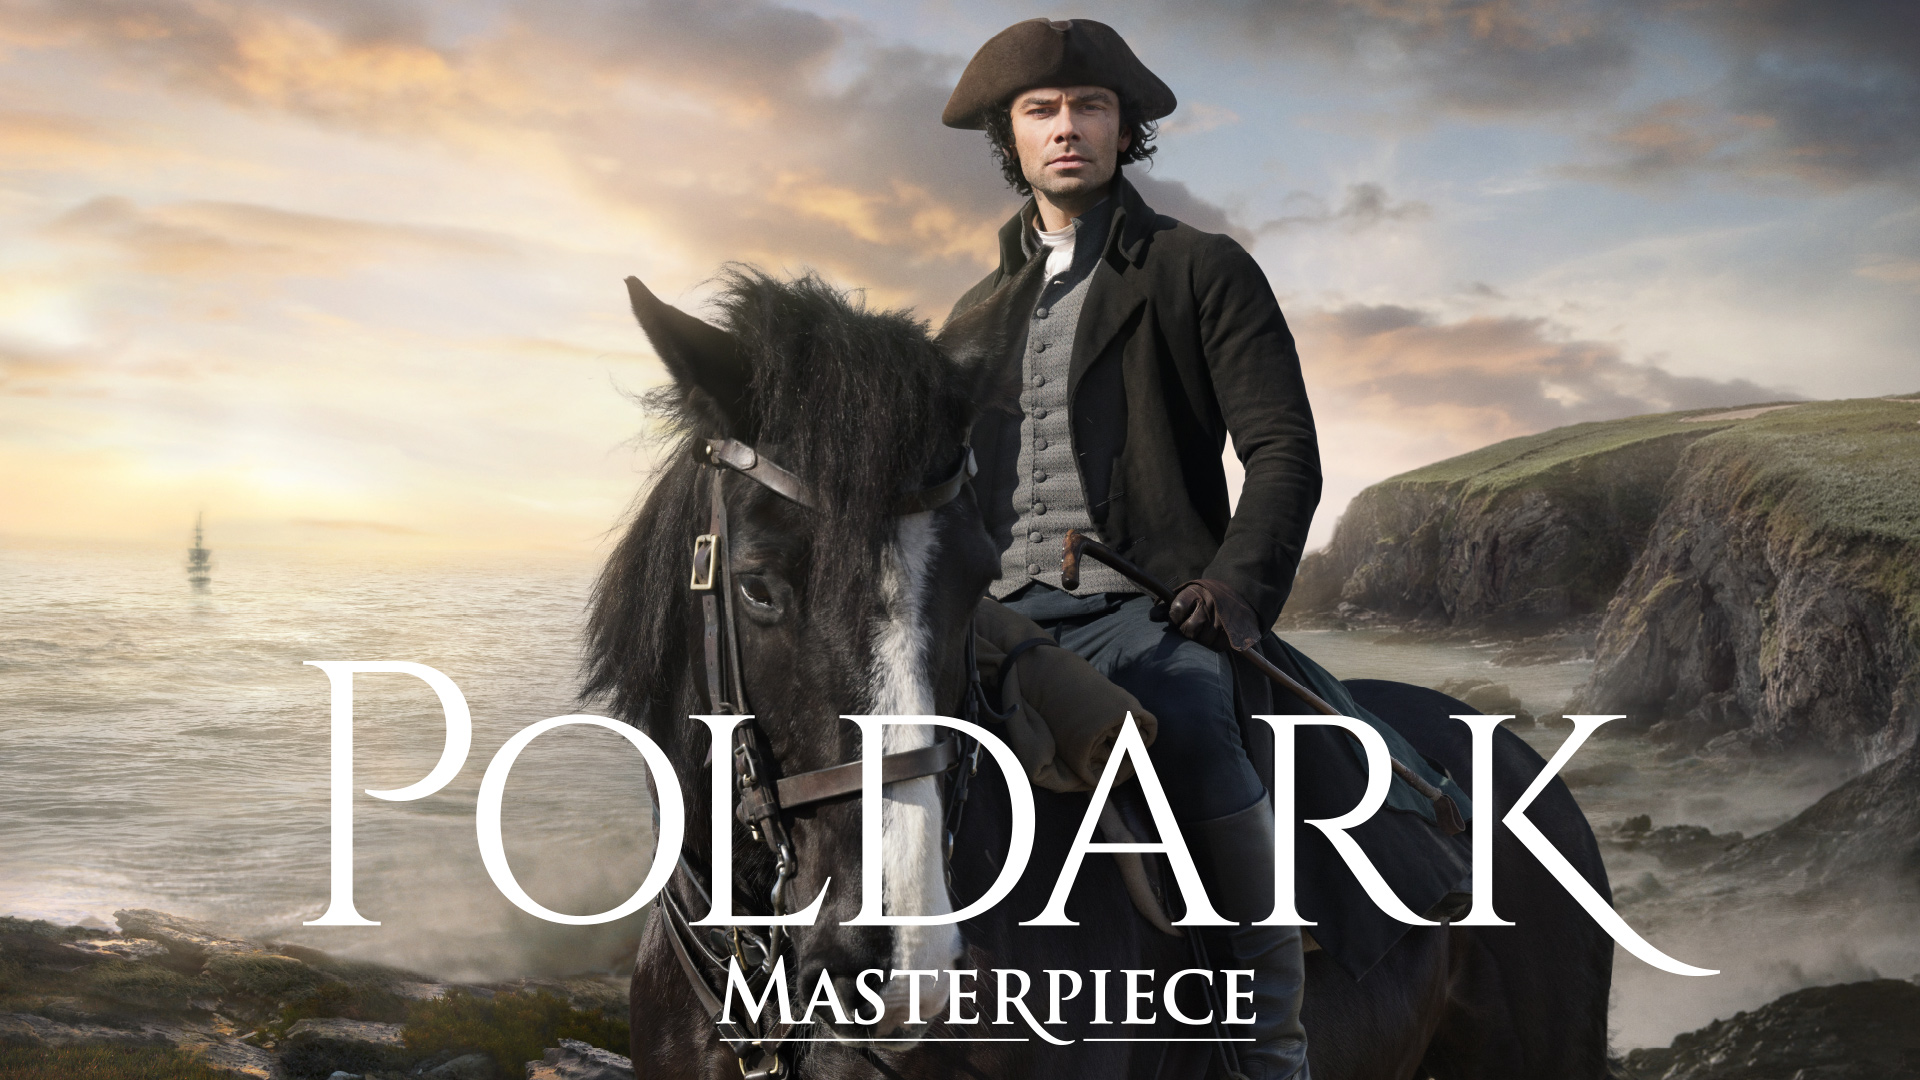 Poldark, Season 2, Episode 4